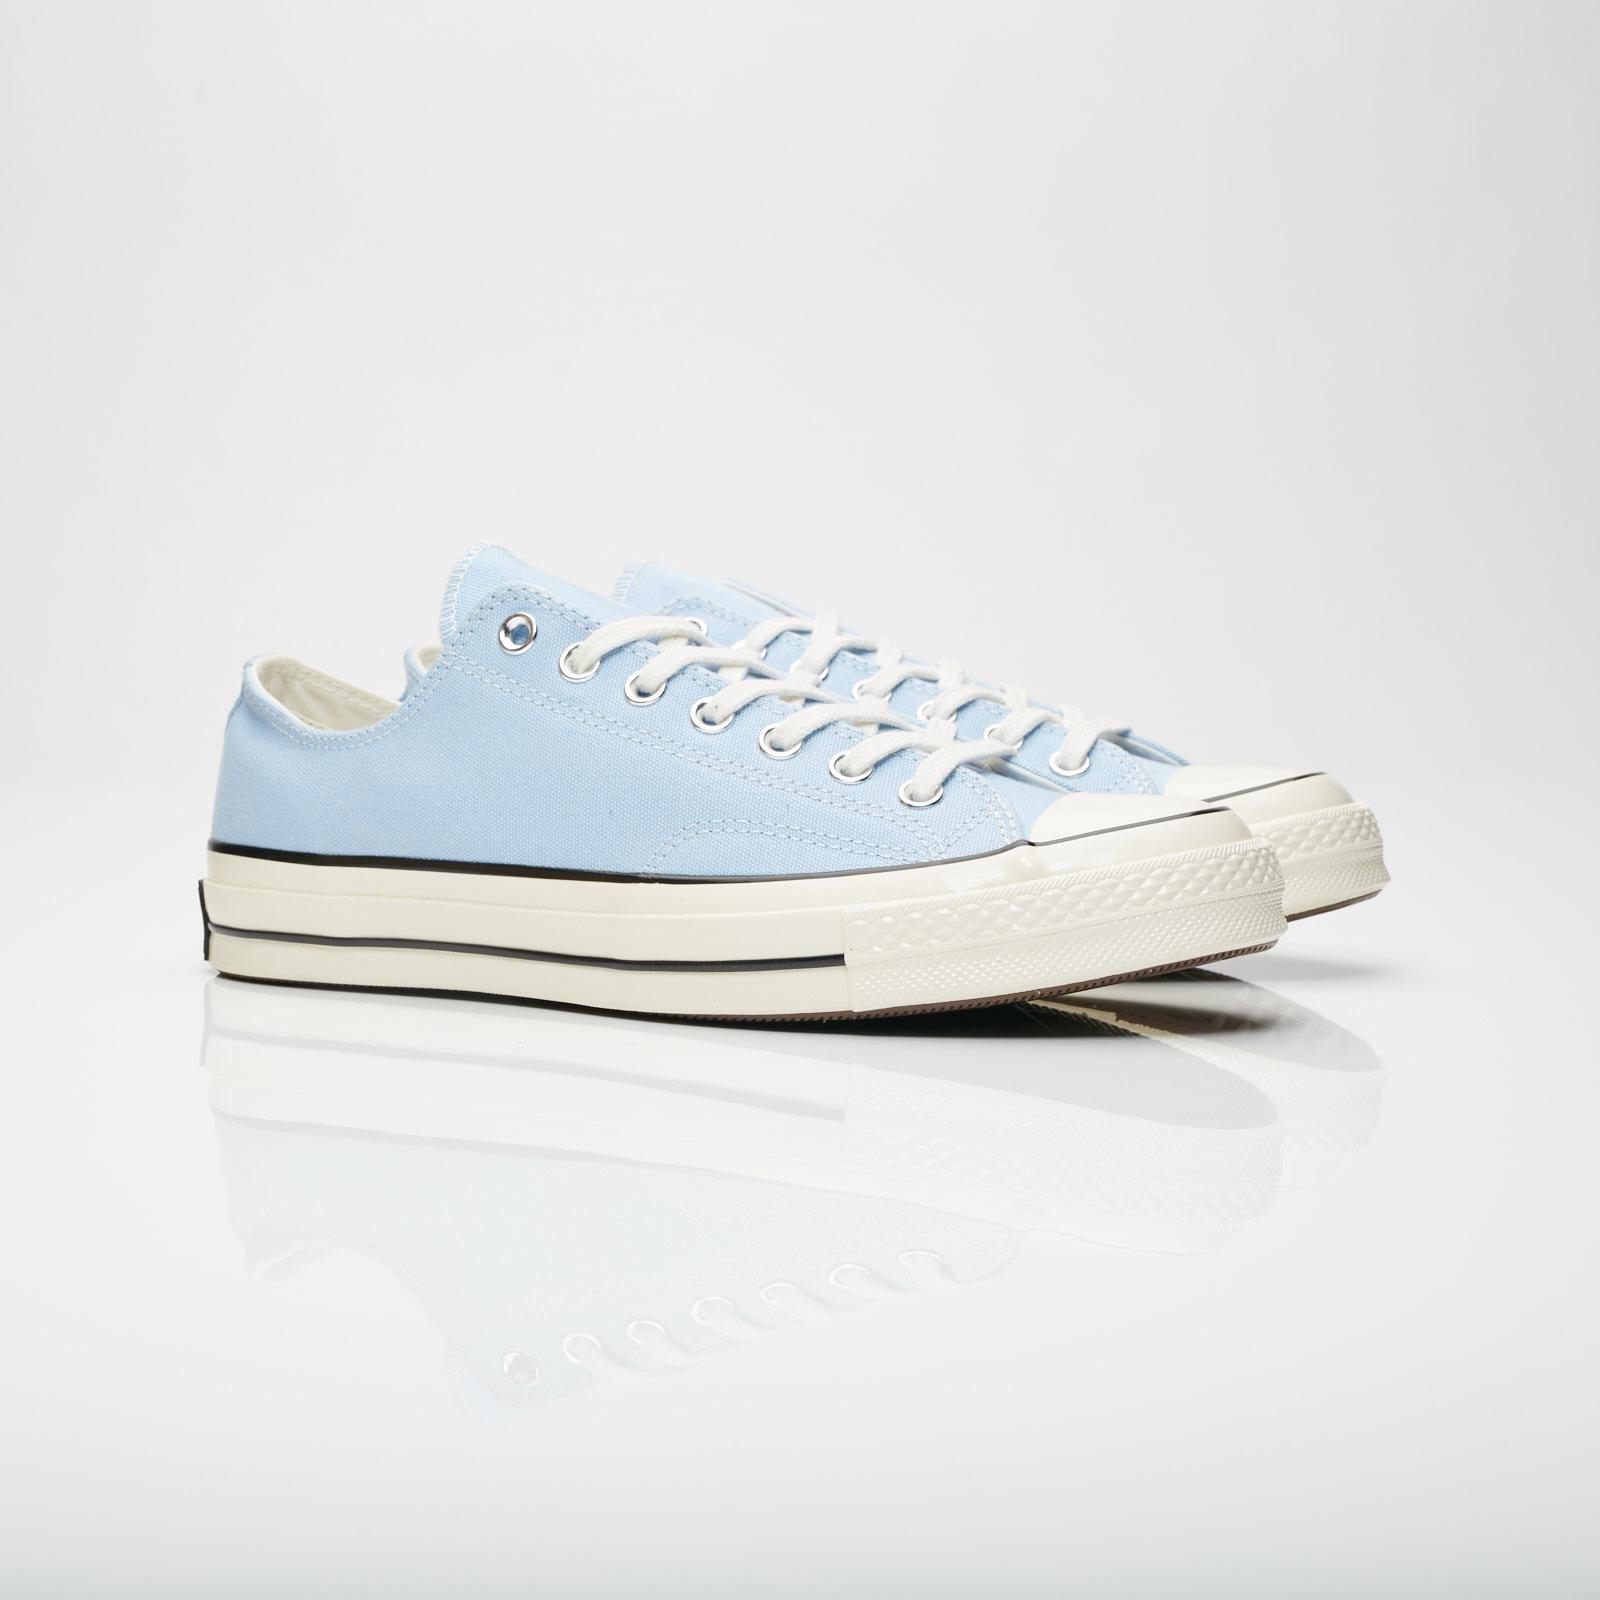 8690aa4dfbfe Converse Chuck Taylor All Star 70s Ox - 159624c - Sneakersnstuff ...